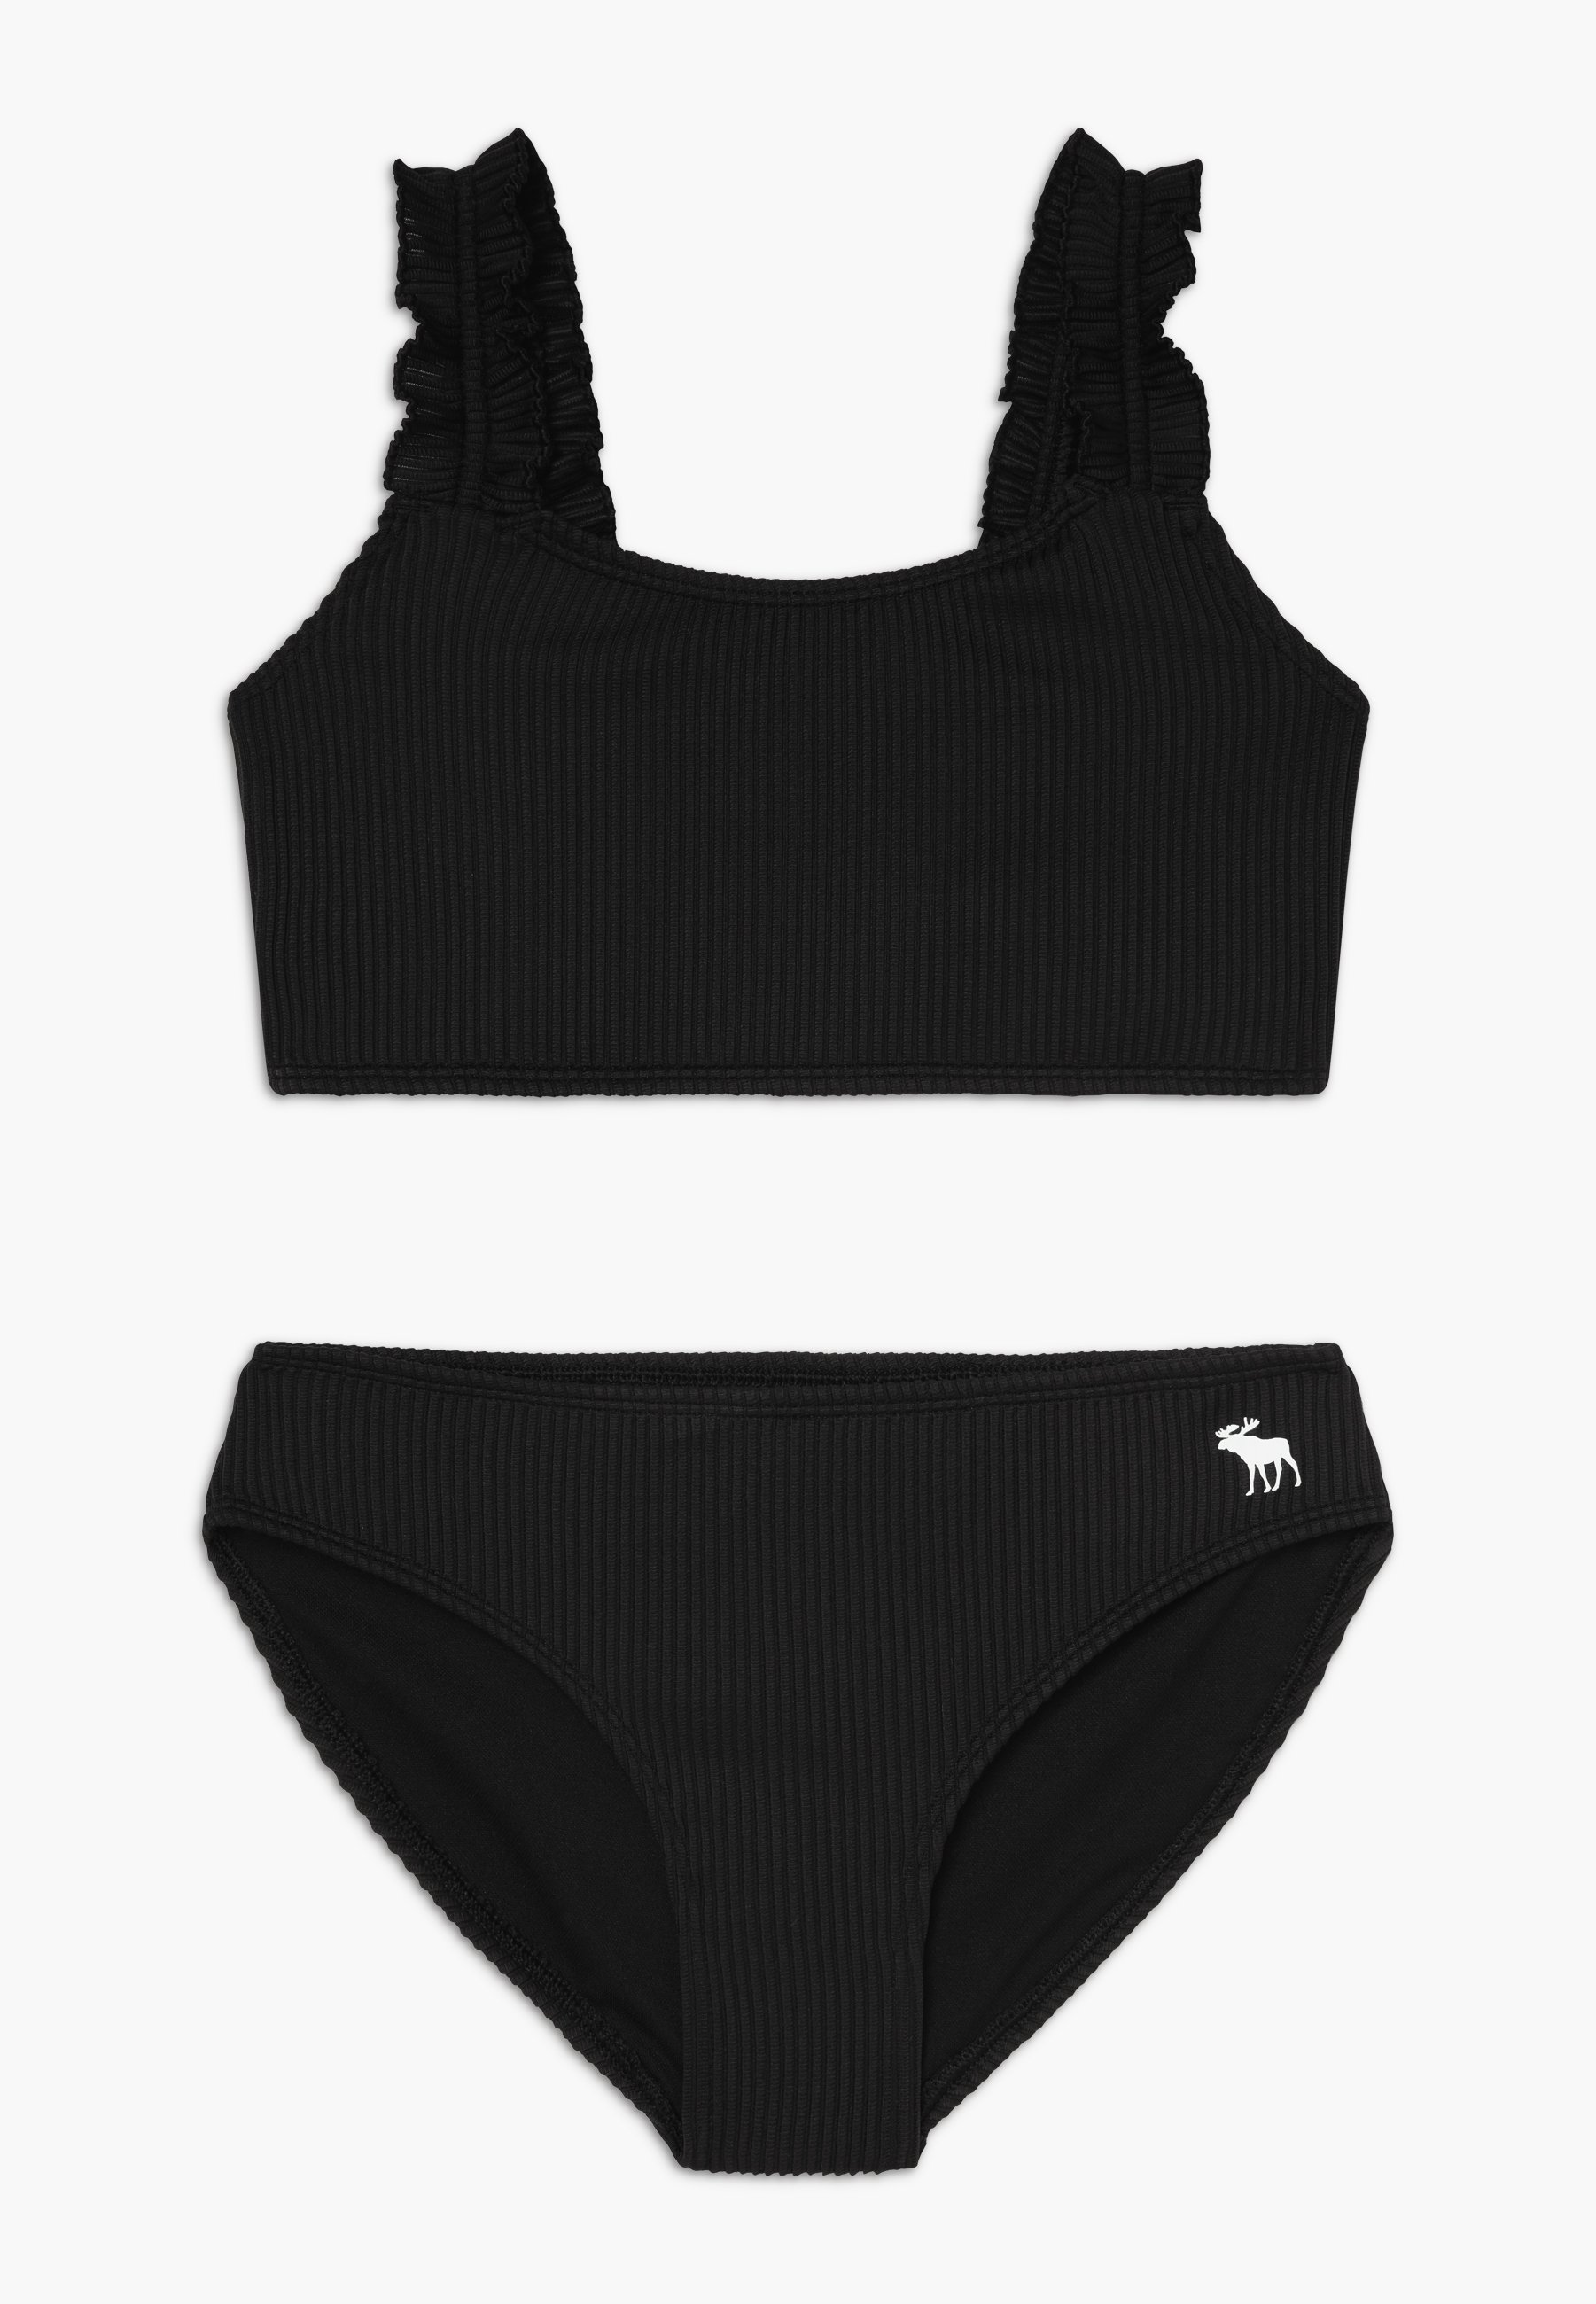 abercrombie and fitch bikini